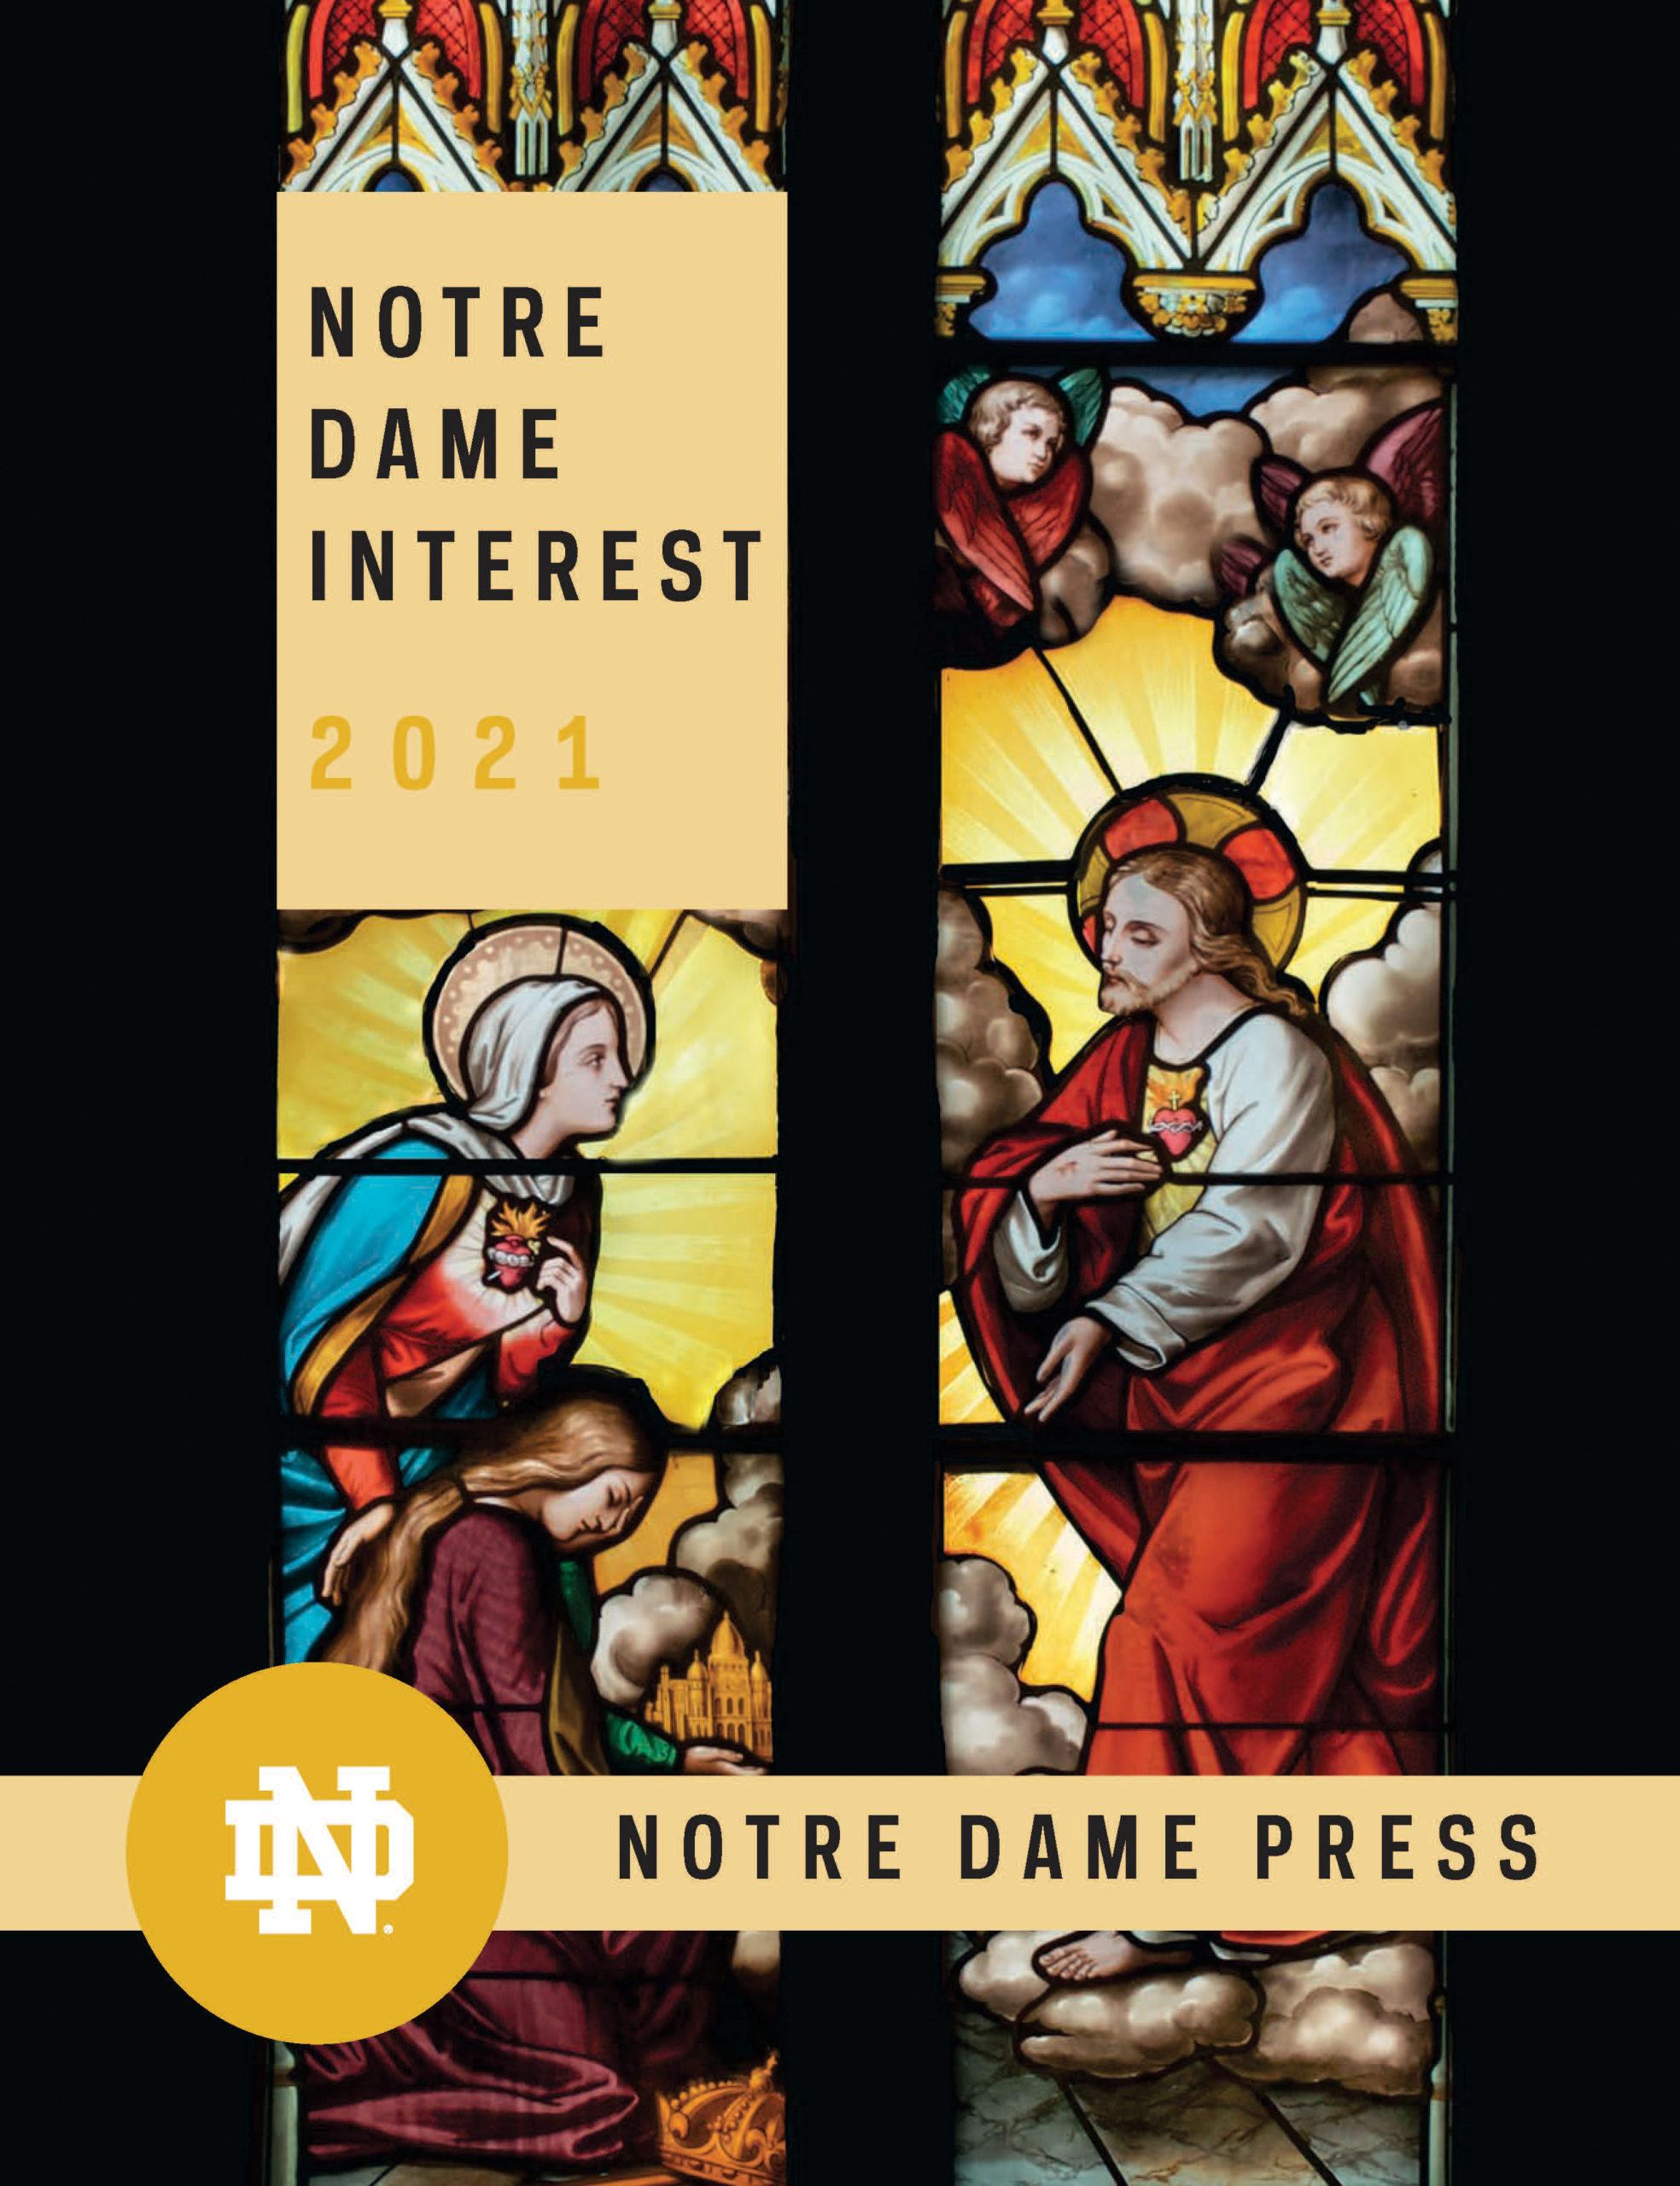 Notre Dame Interest 2021